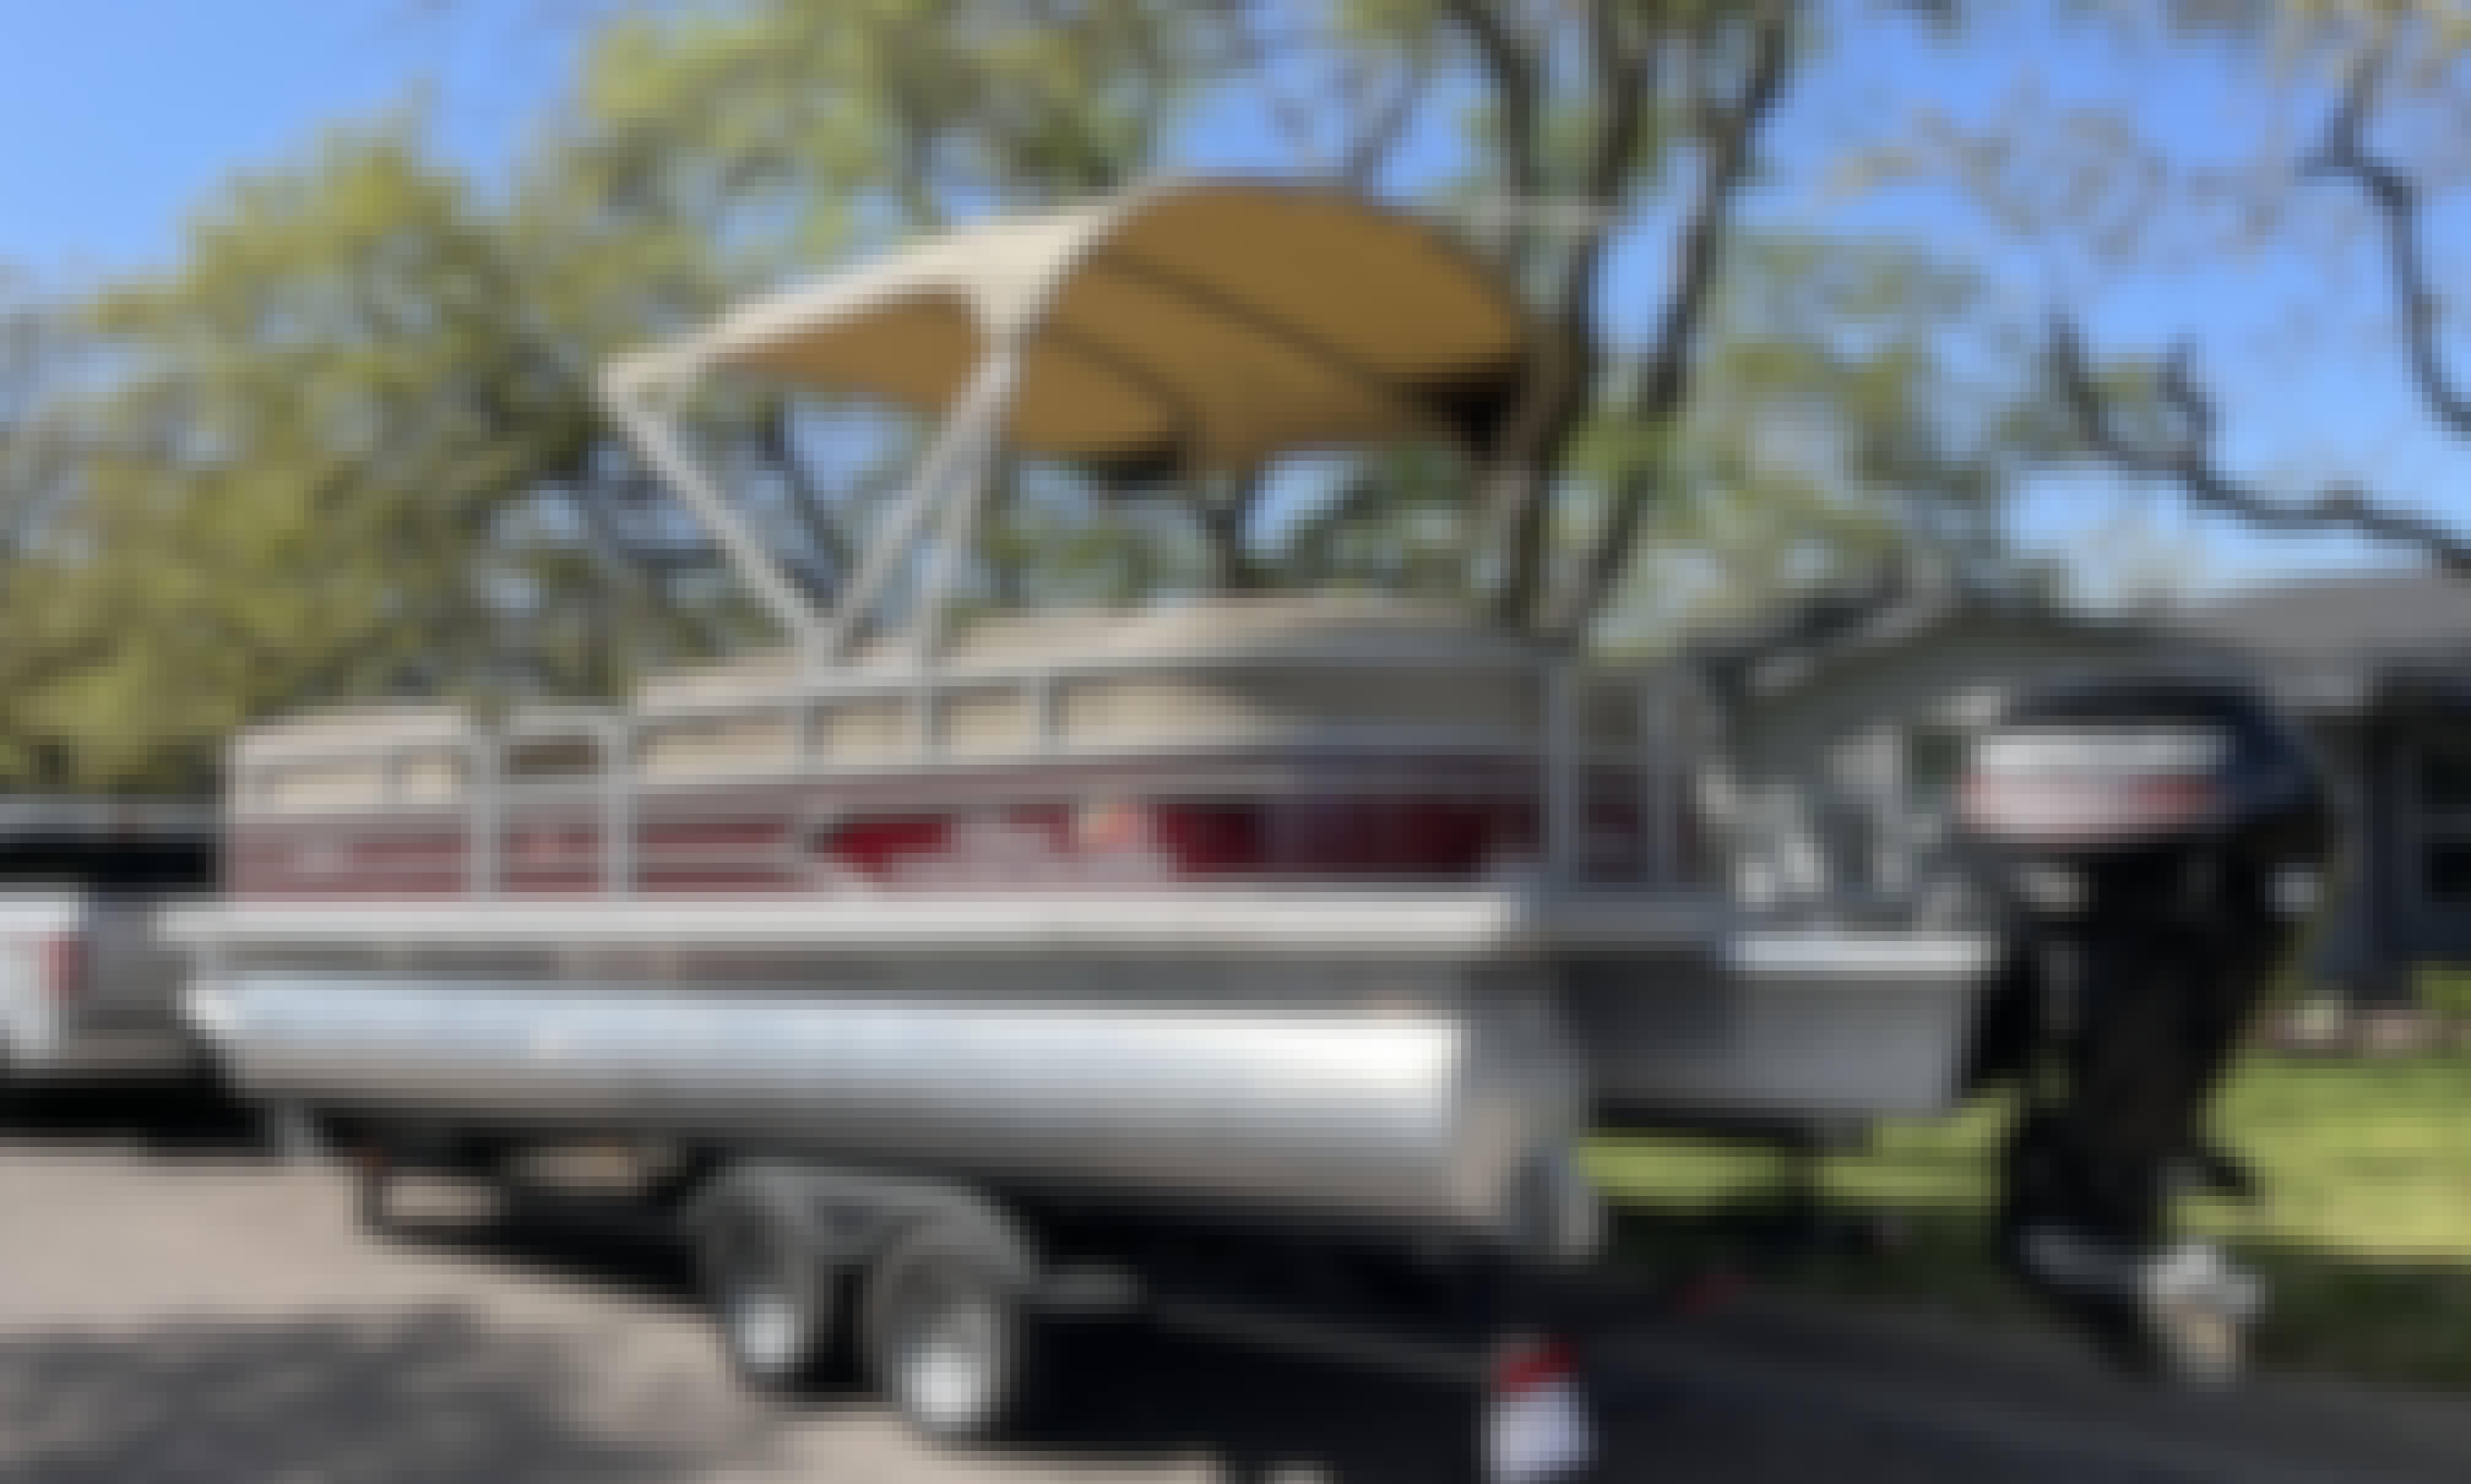 Sun Tracker 24 Pontoon boat for rent on Joe Pool Lake